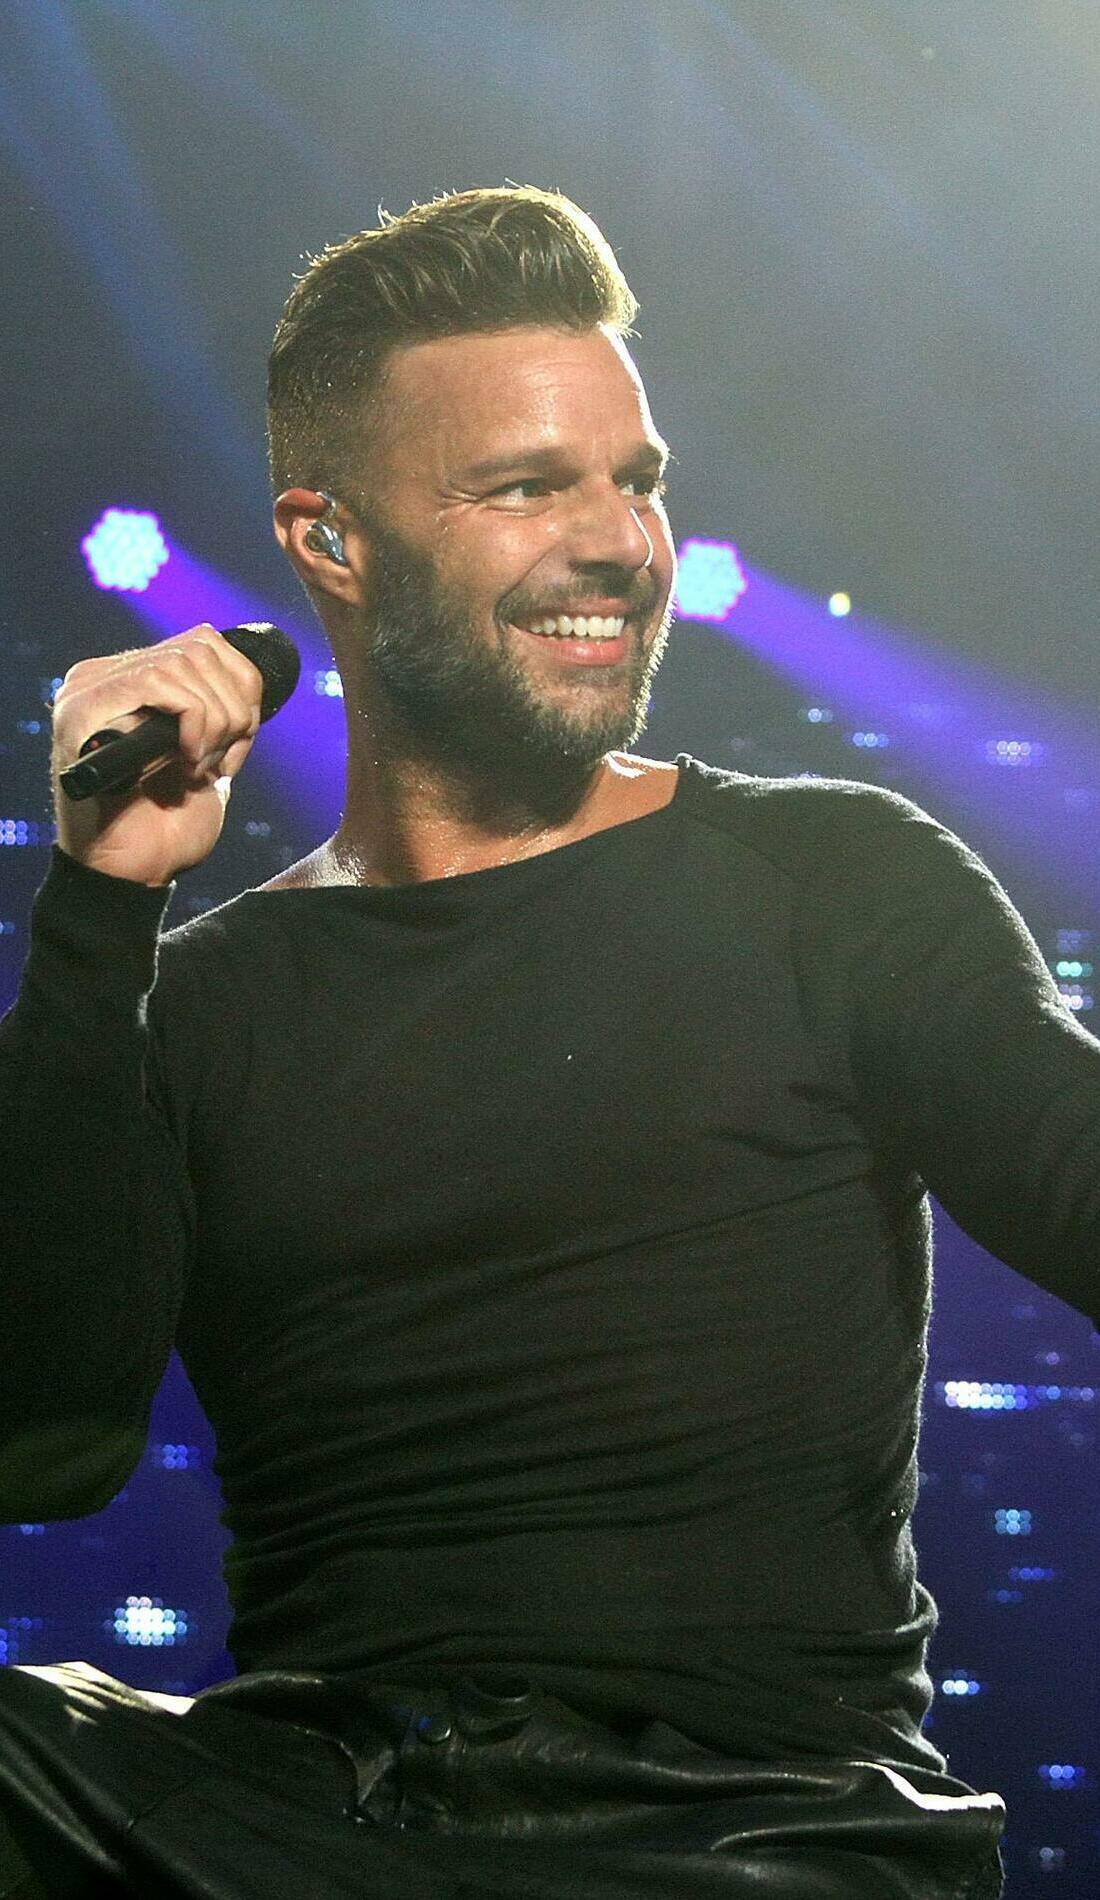 A Ricky Martin live event